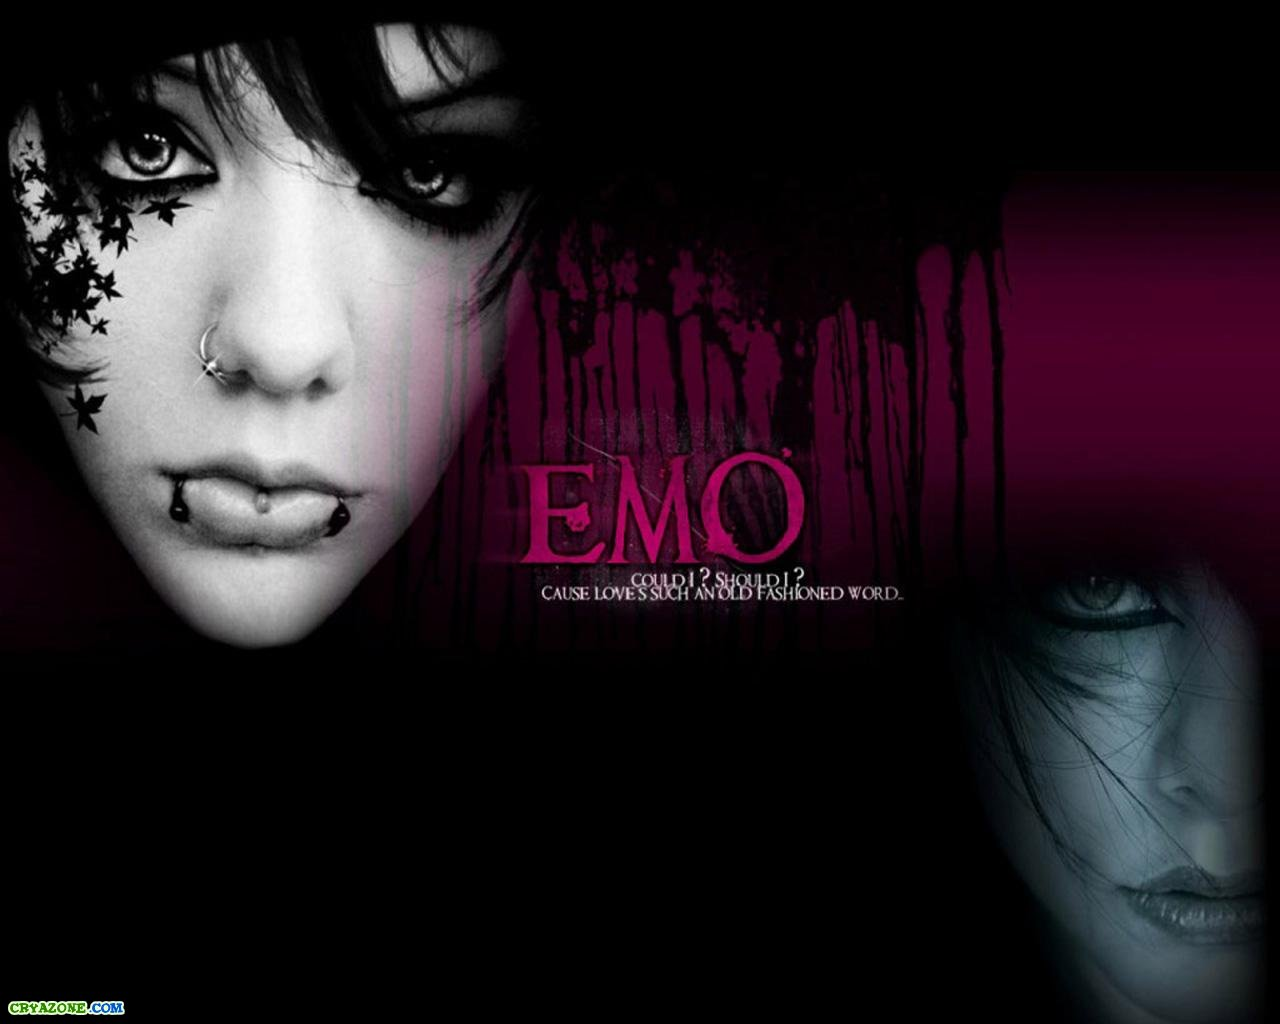 Emo girl wallpaper for facebook.